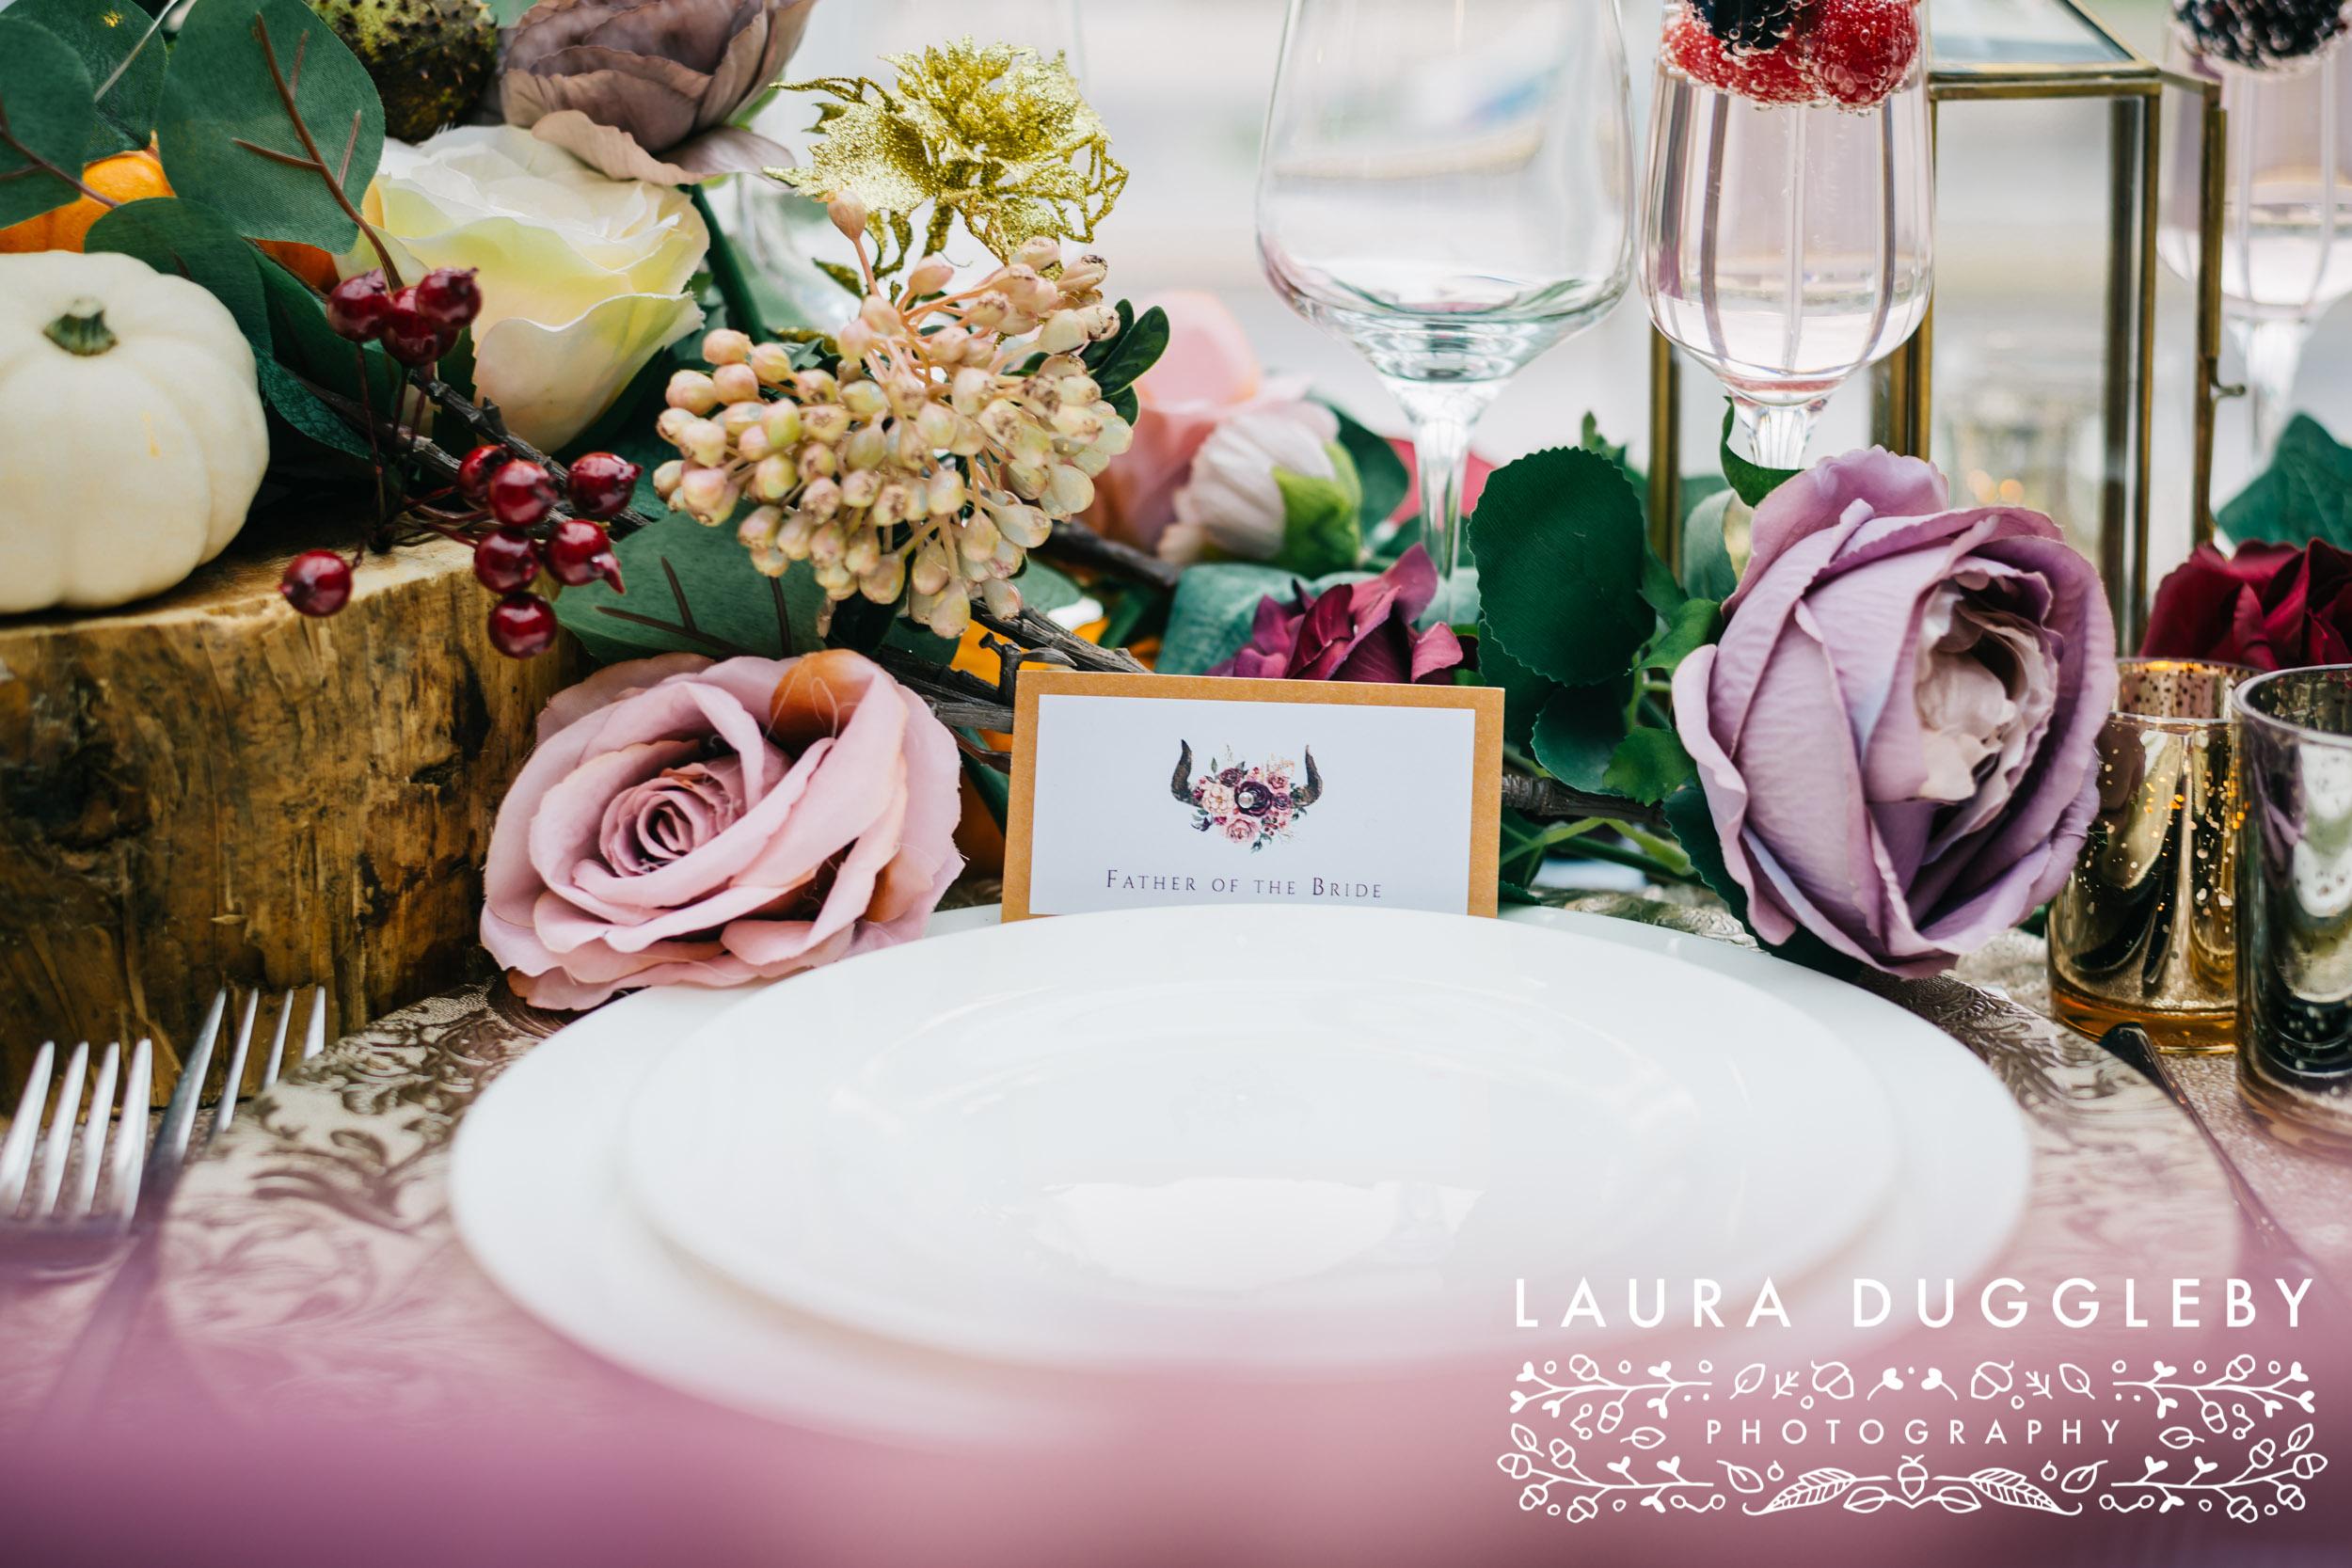 Thornton Hall Country Park - Wedding Photographer10